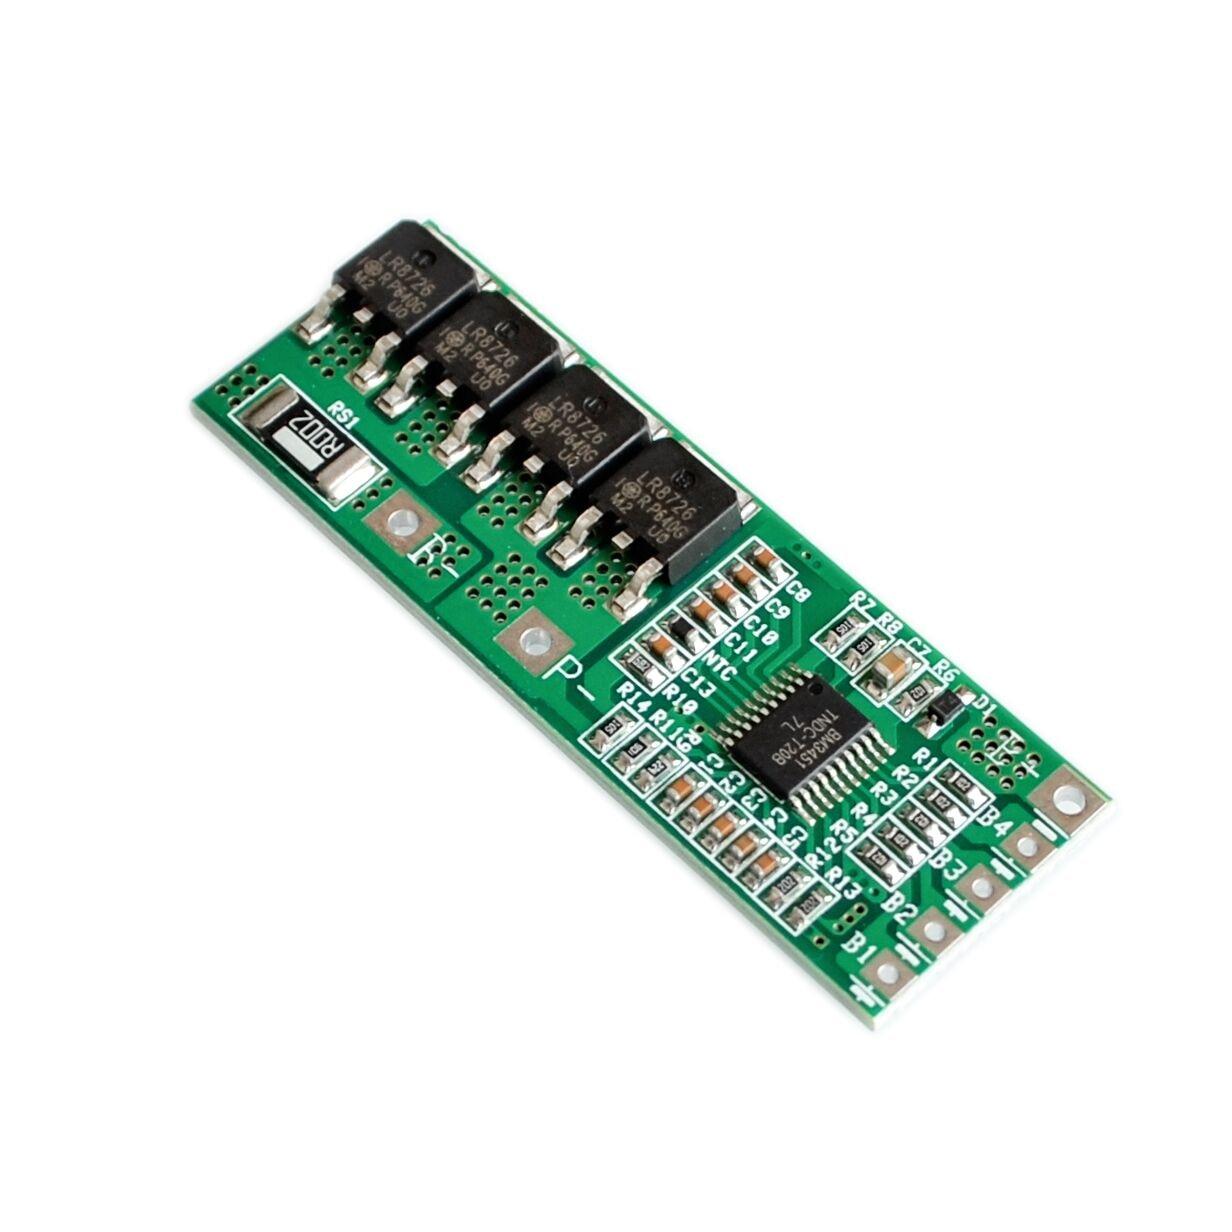 Voltage LED Indicator Capacity Display For 3S 11.1V-12.6V Li-ion Li-Po Batteries